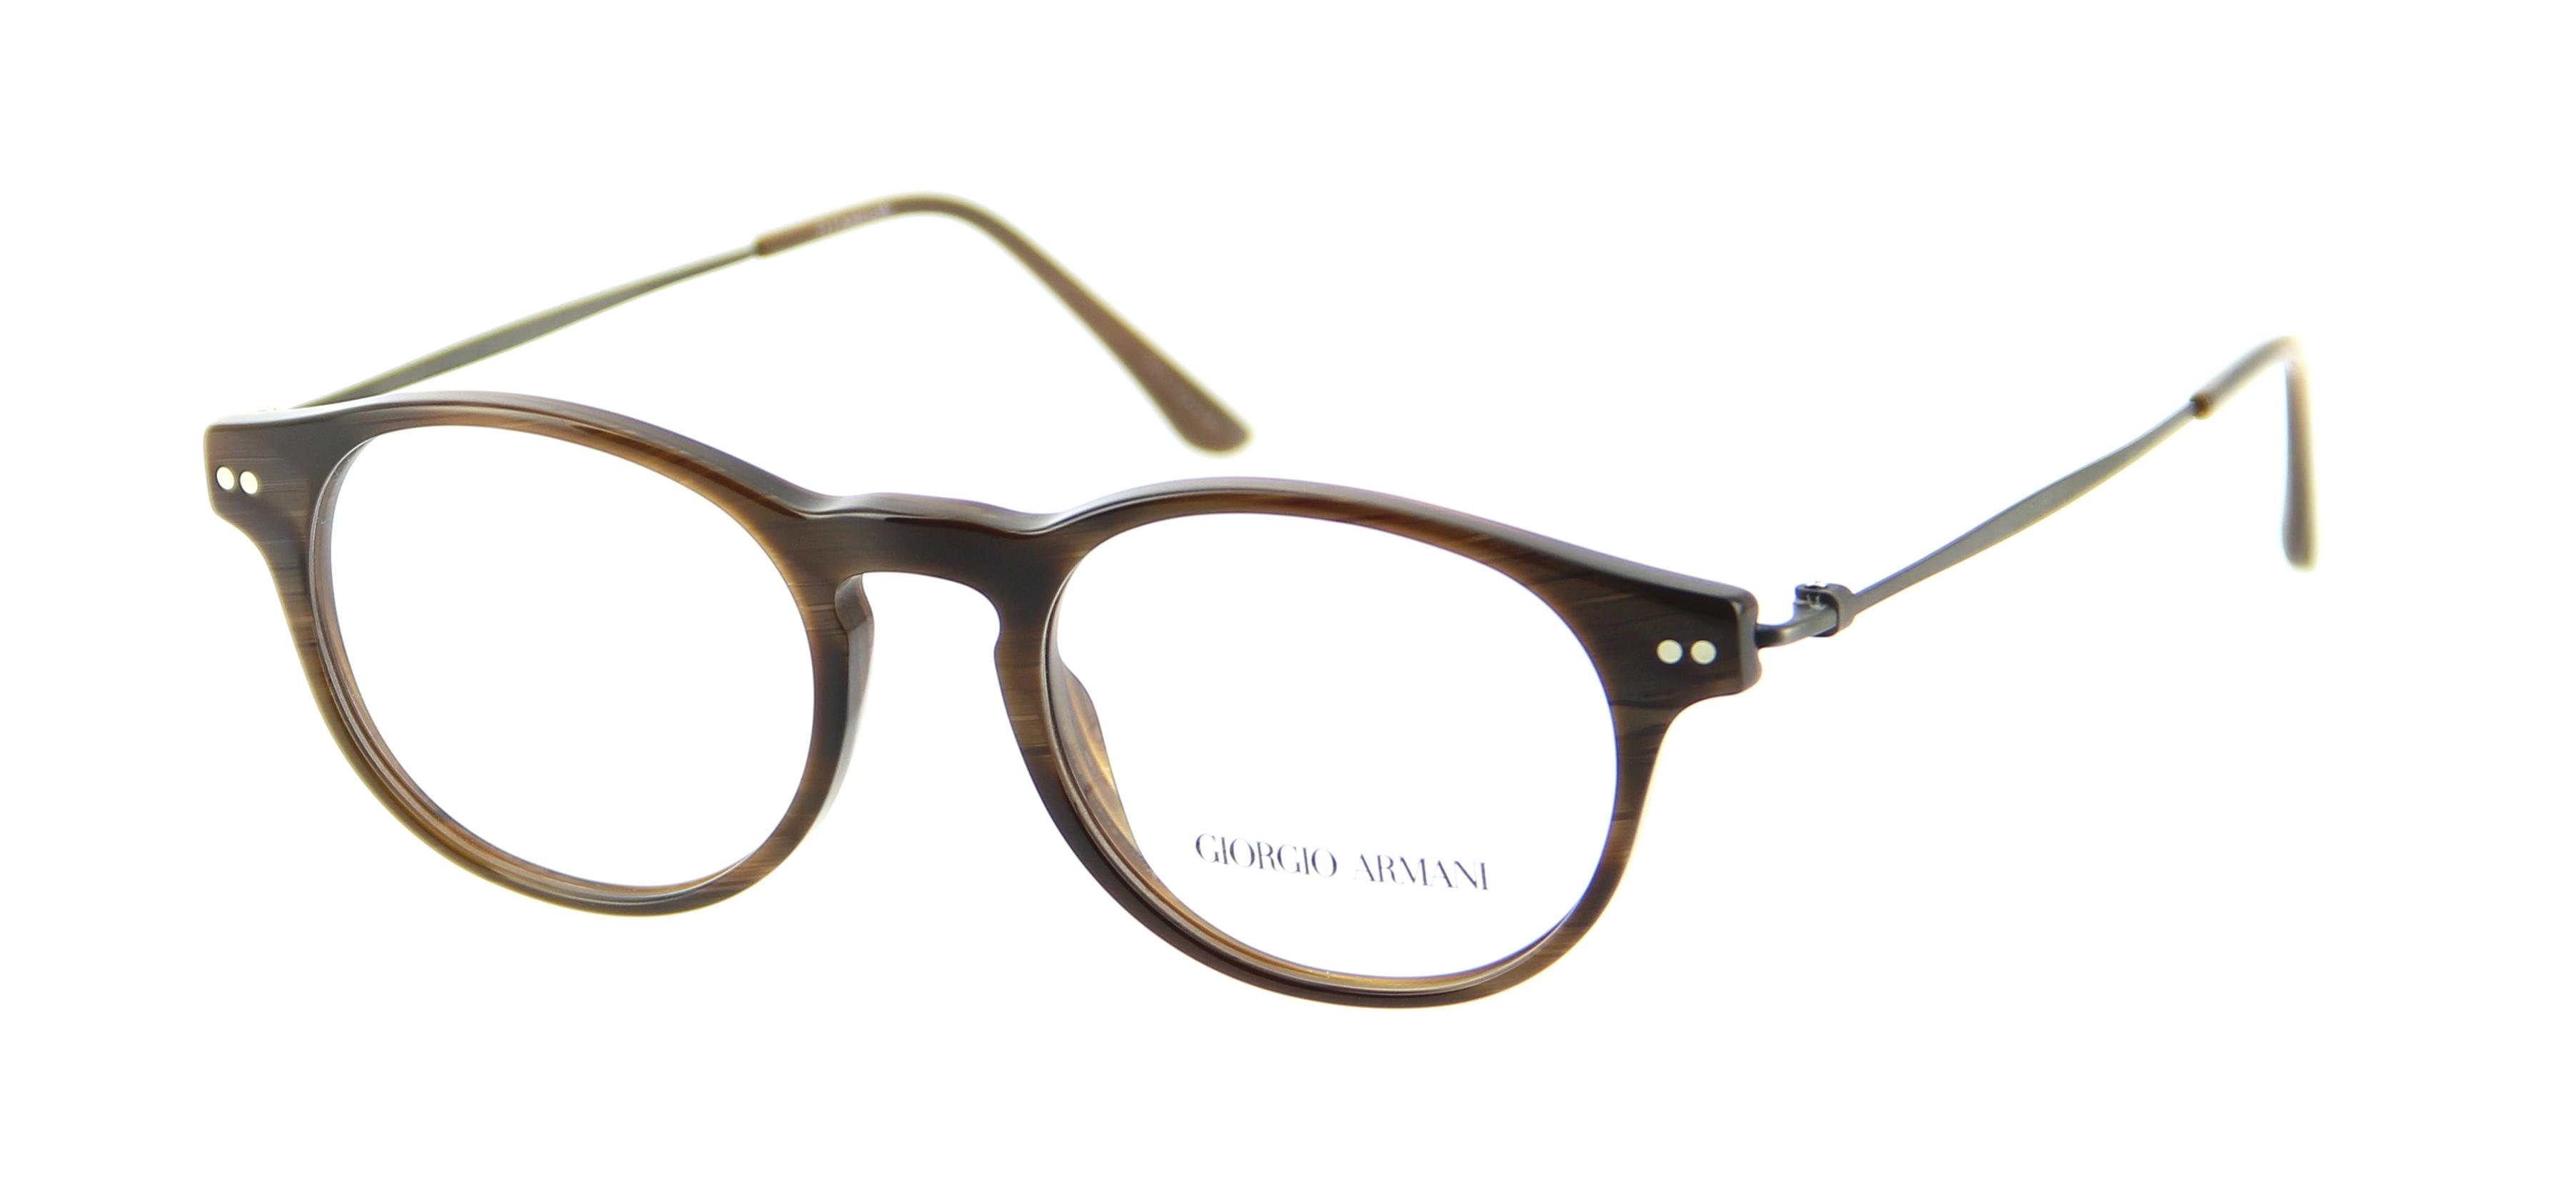 Armani Glasses Frames 2015 : Eyeglasses GIORGIO ARMANI AR 7010 5023 47/18 Man Marron ...